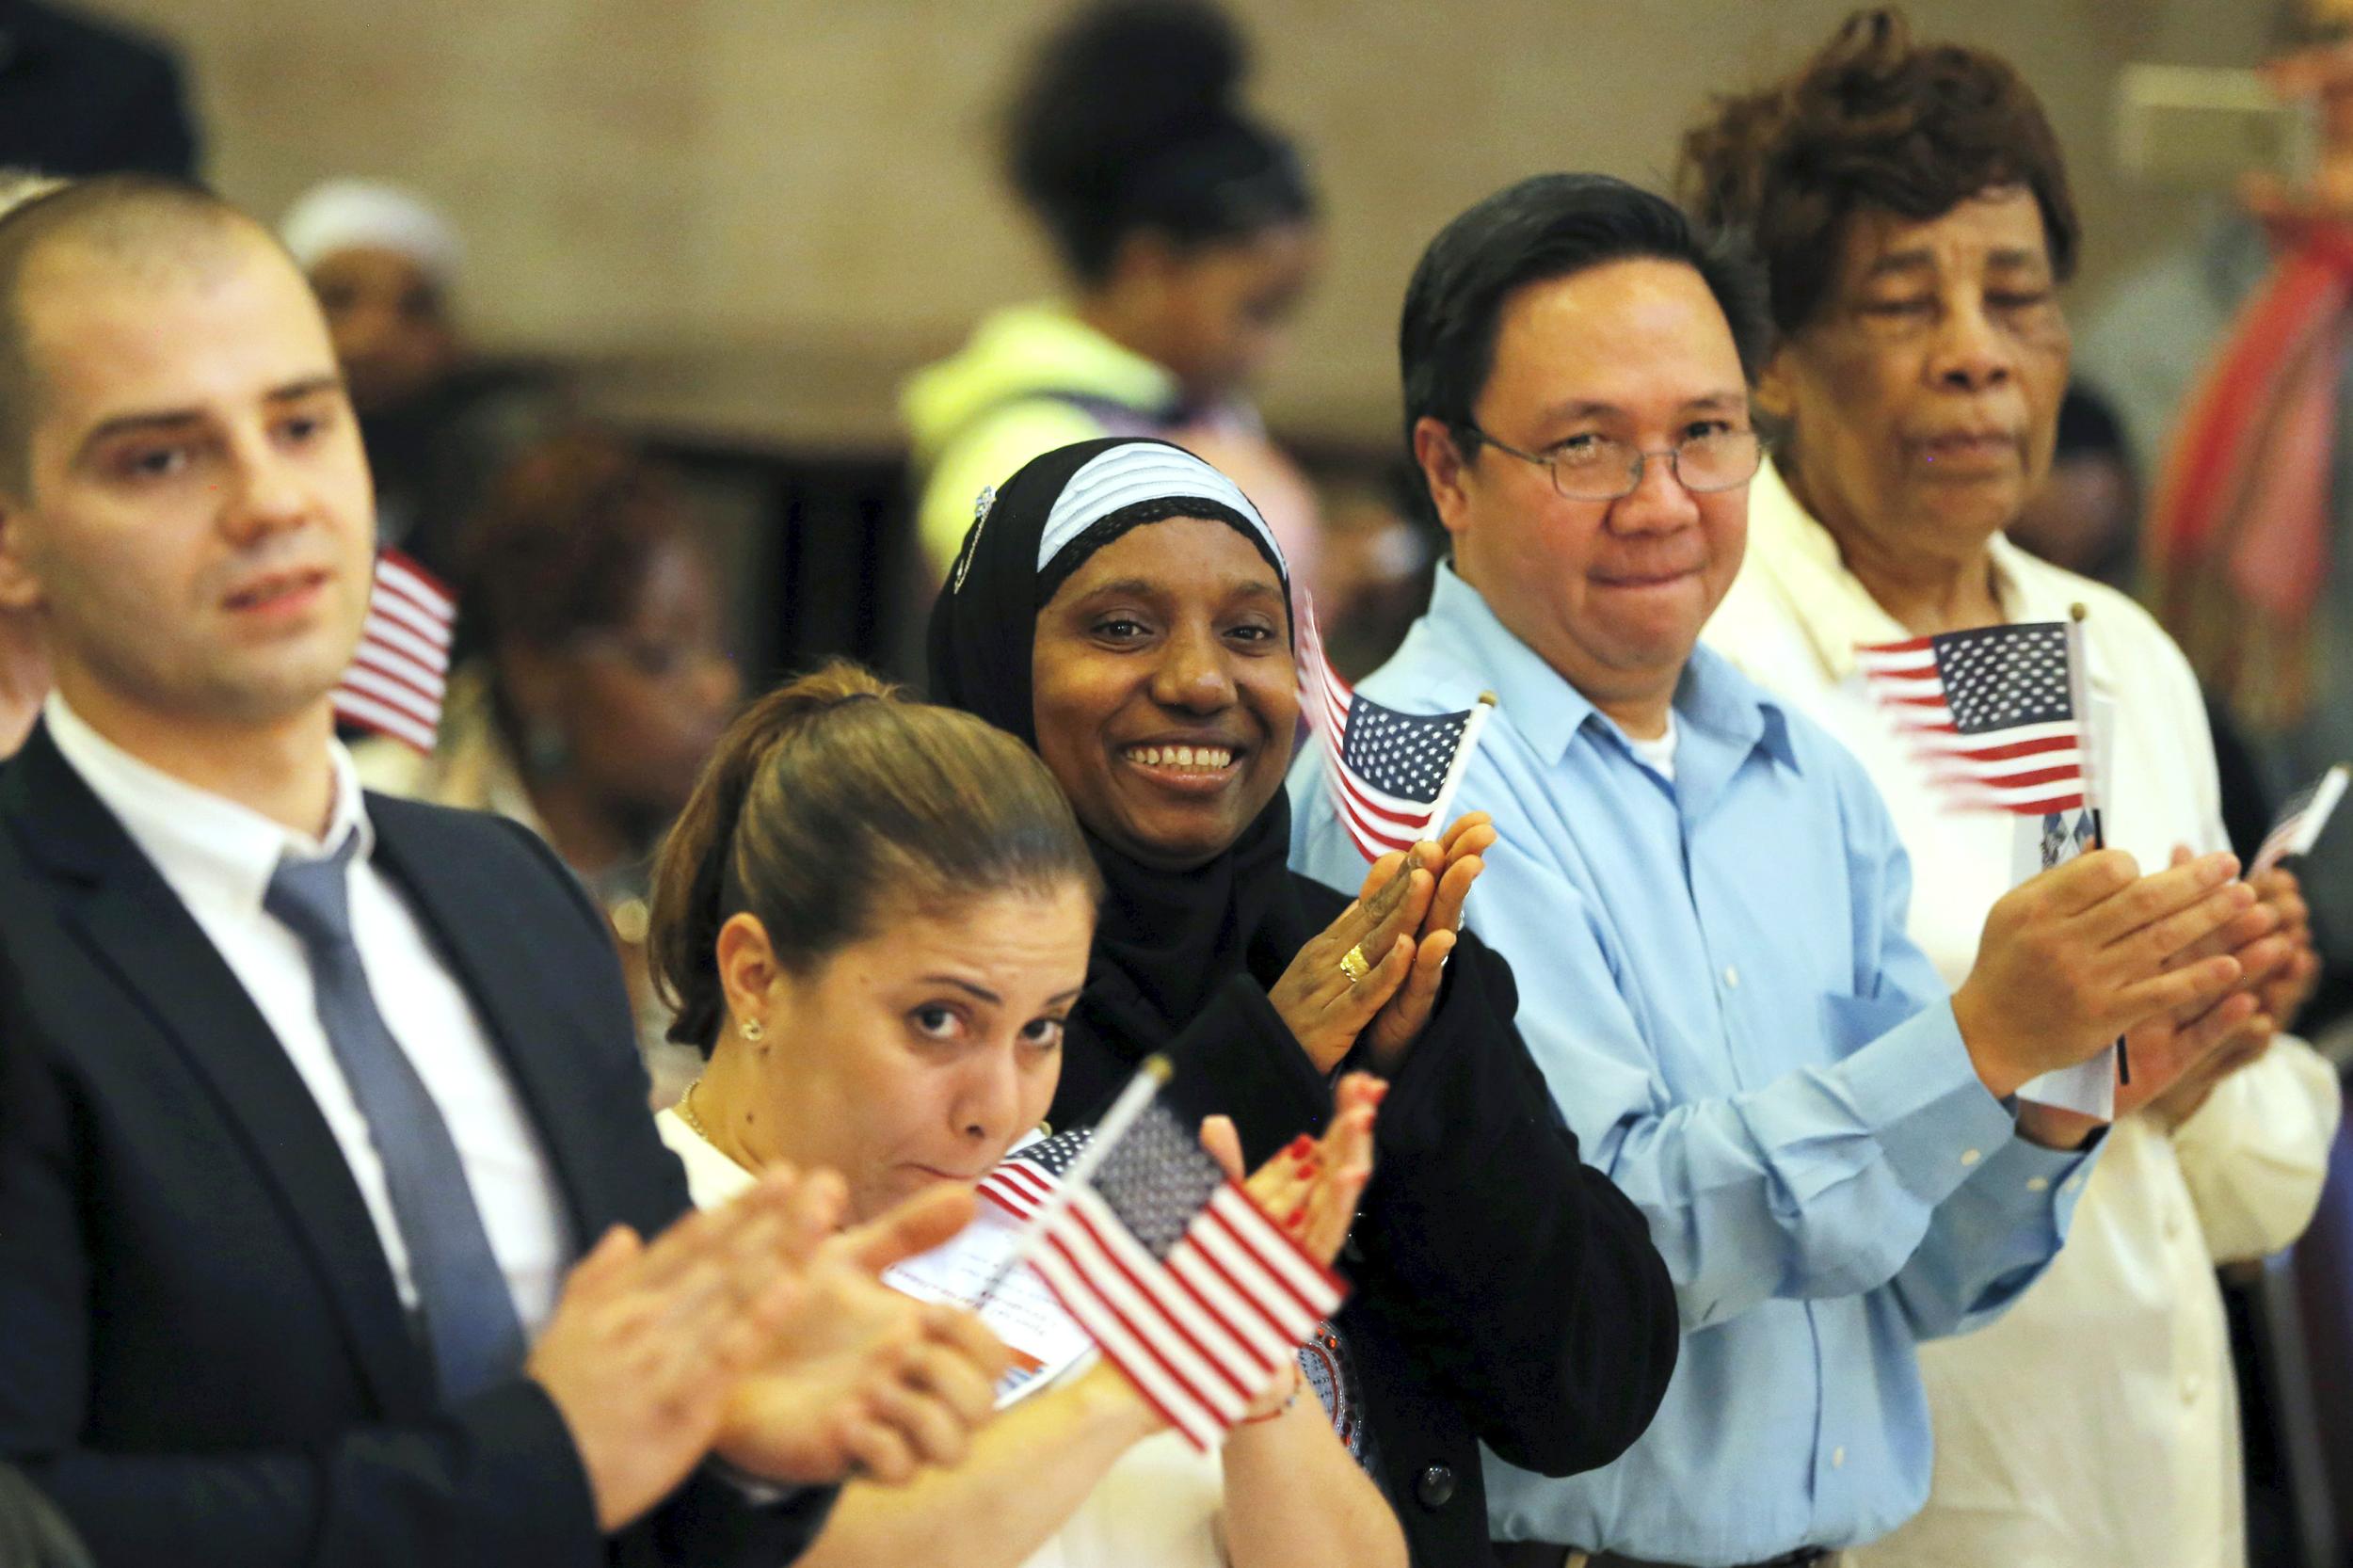 New Citizens Sworn in at Emotional Naturalization Ceremonies